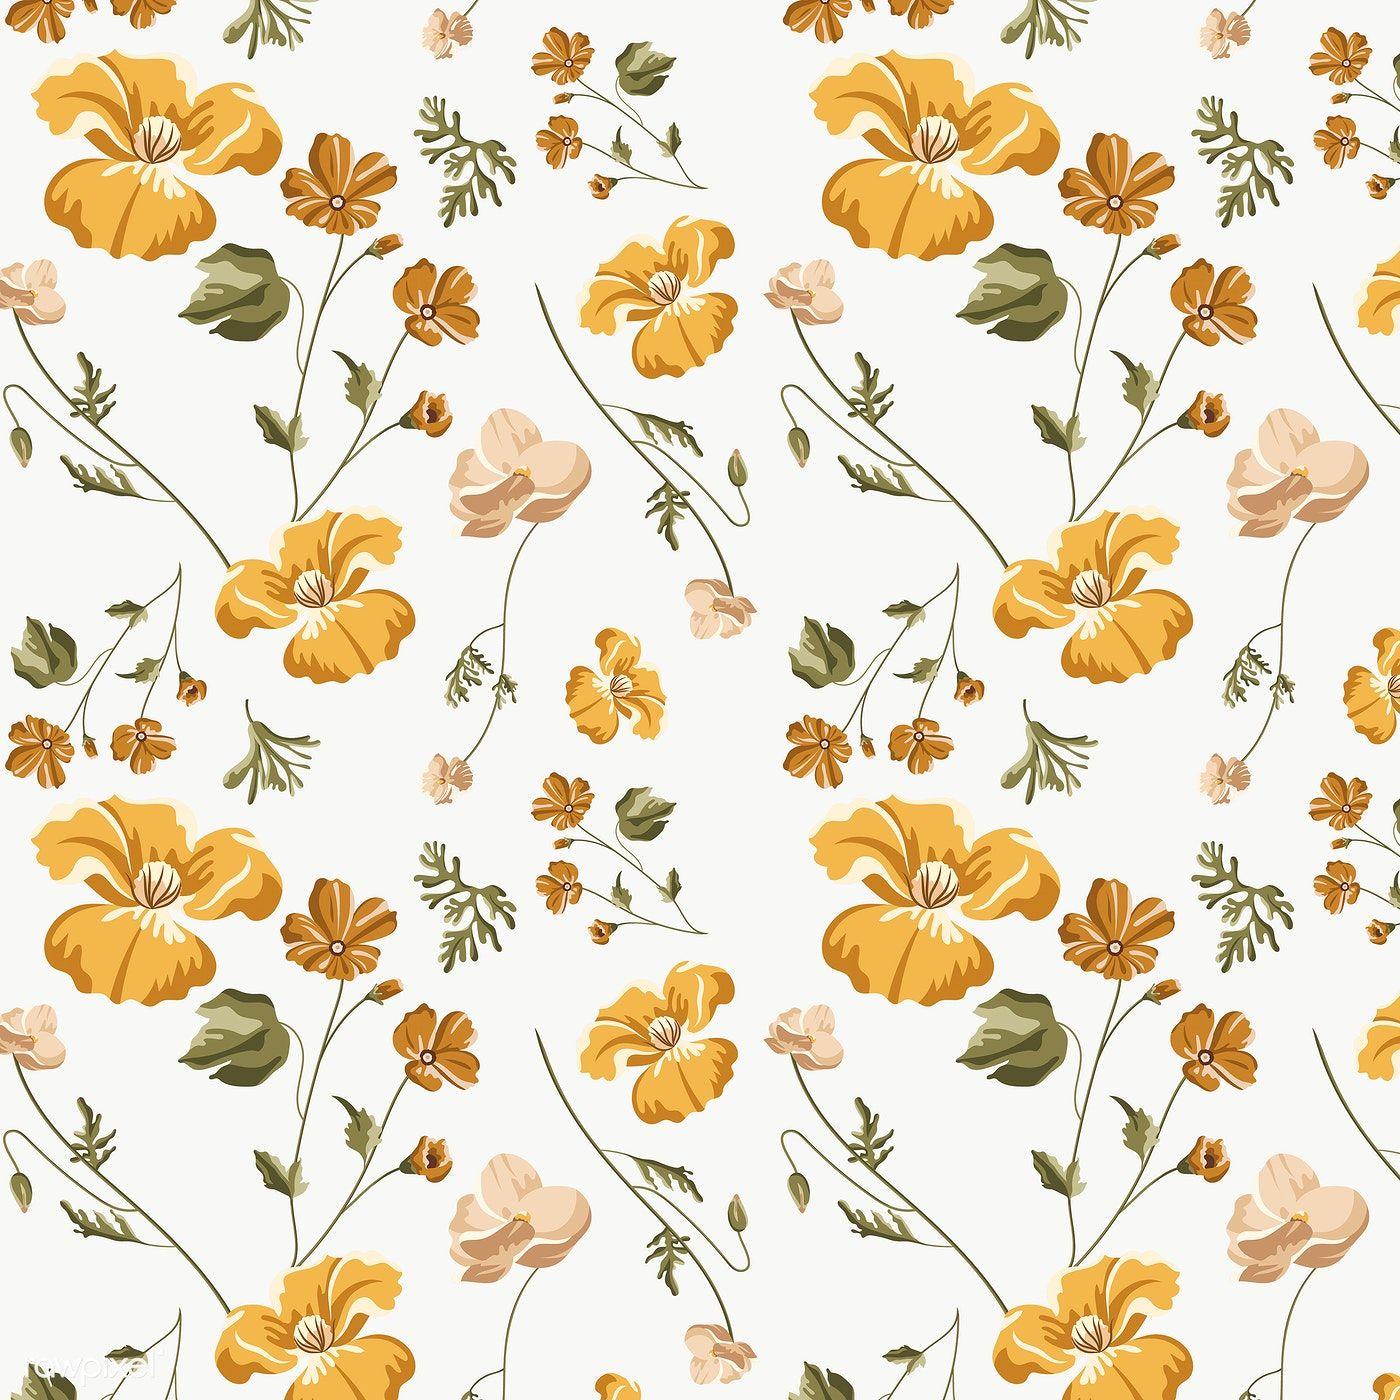 Yellow Flowers Illustration Design Element Premium Image By Rawpixel Com Aew Vintage Flower Backgrounds Yellow Flower Pictures Yellow Flower Wallpaper